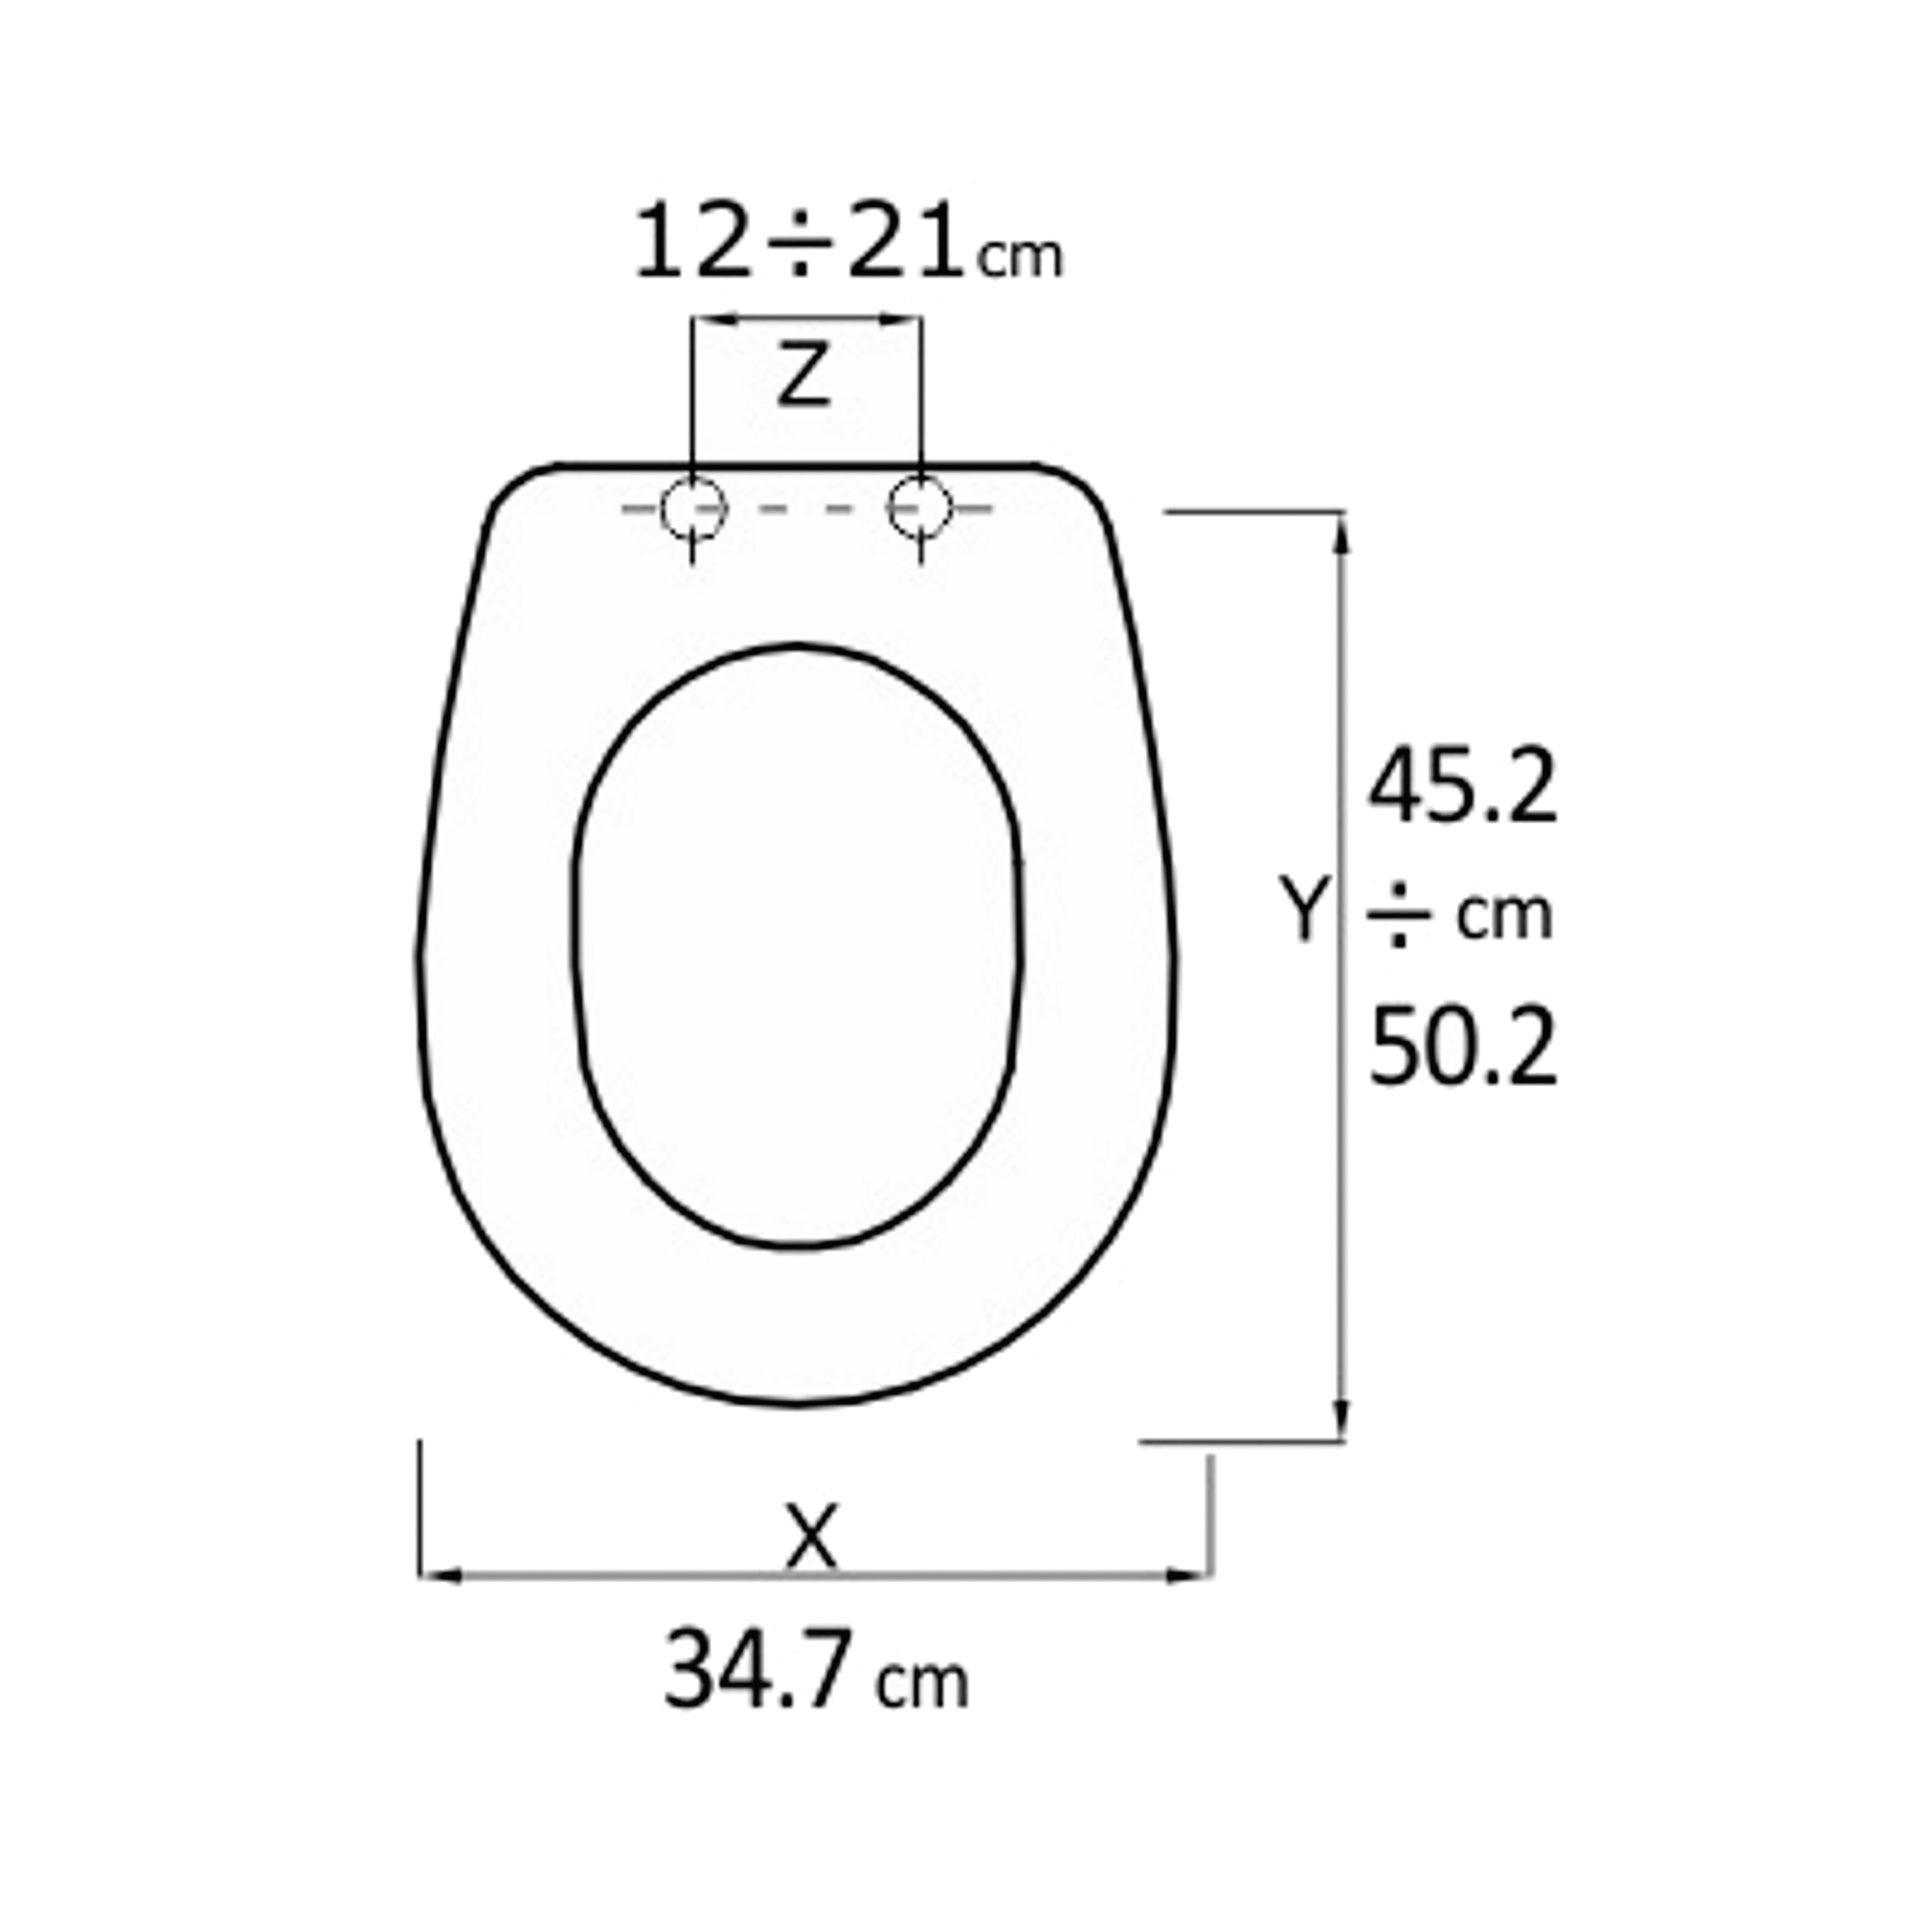 Copriwater ovale Universale Liuto mdf bianco - 2